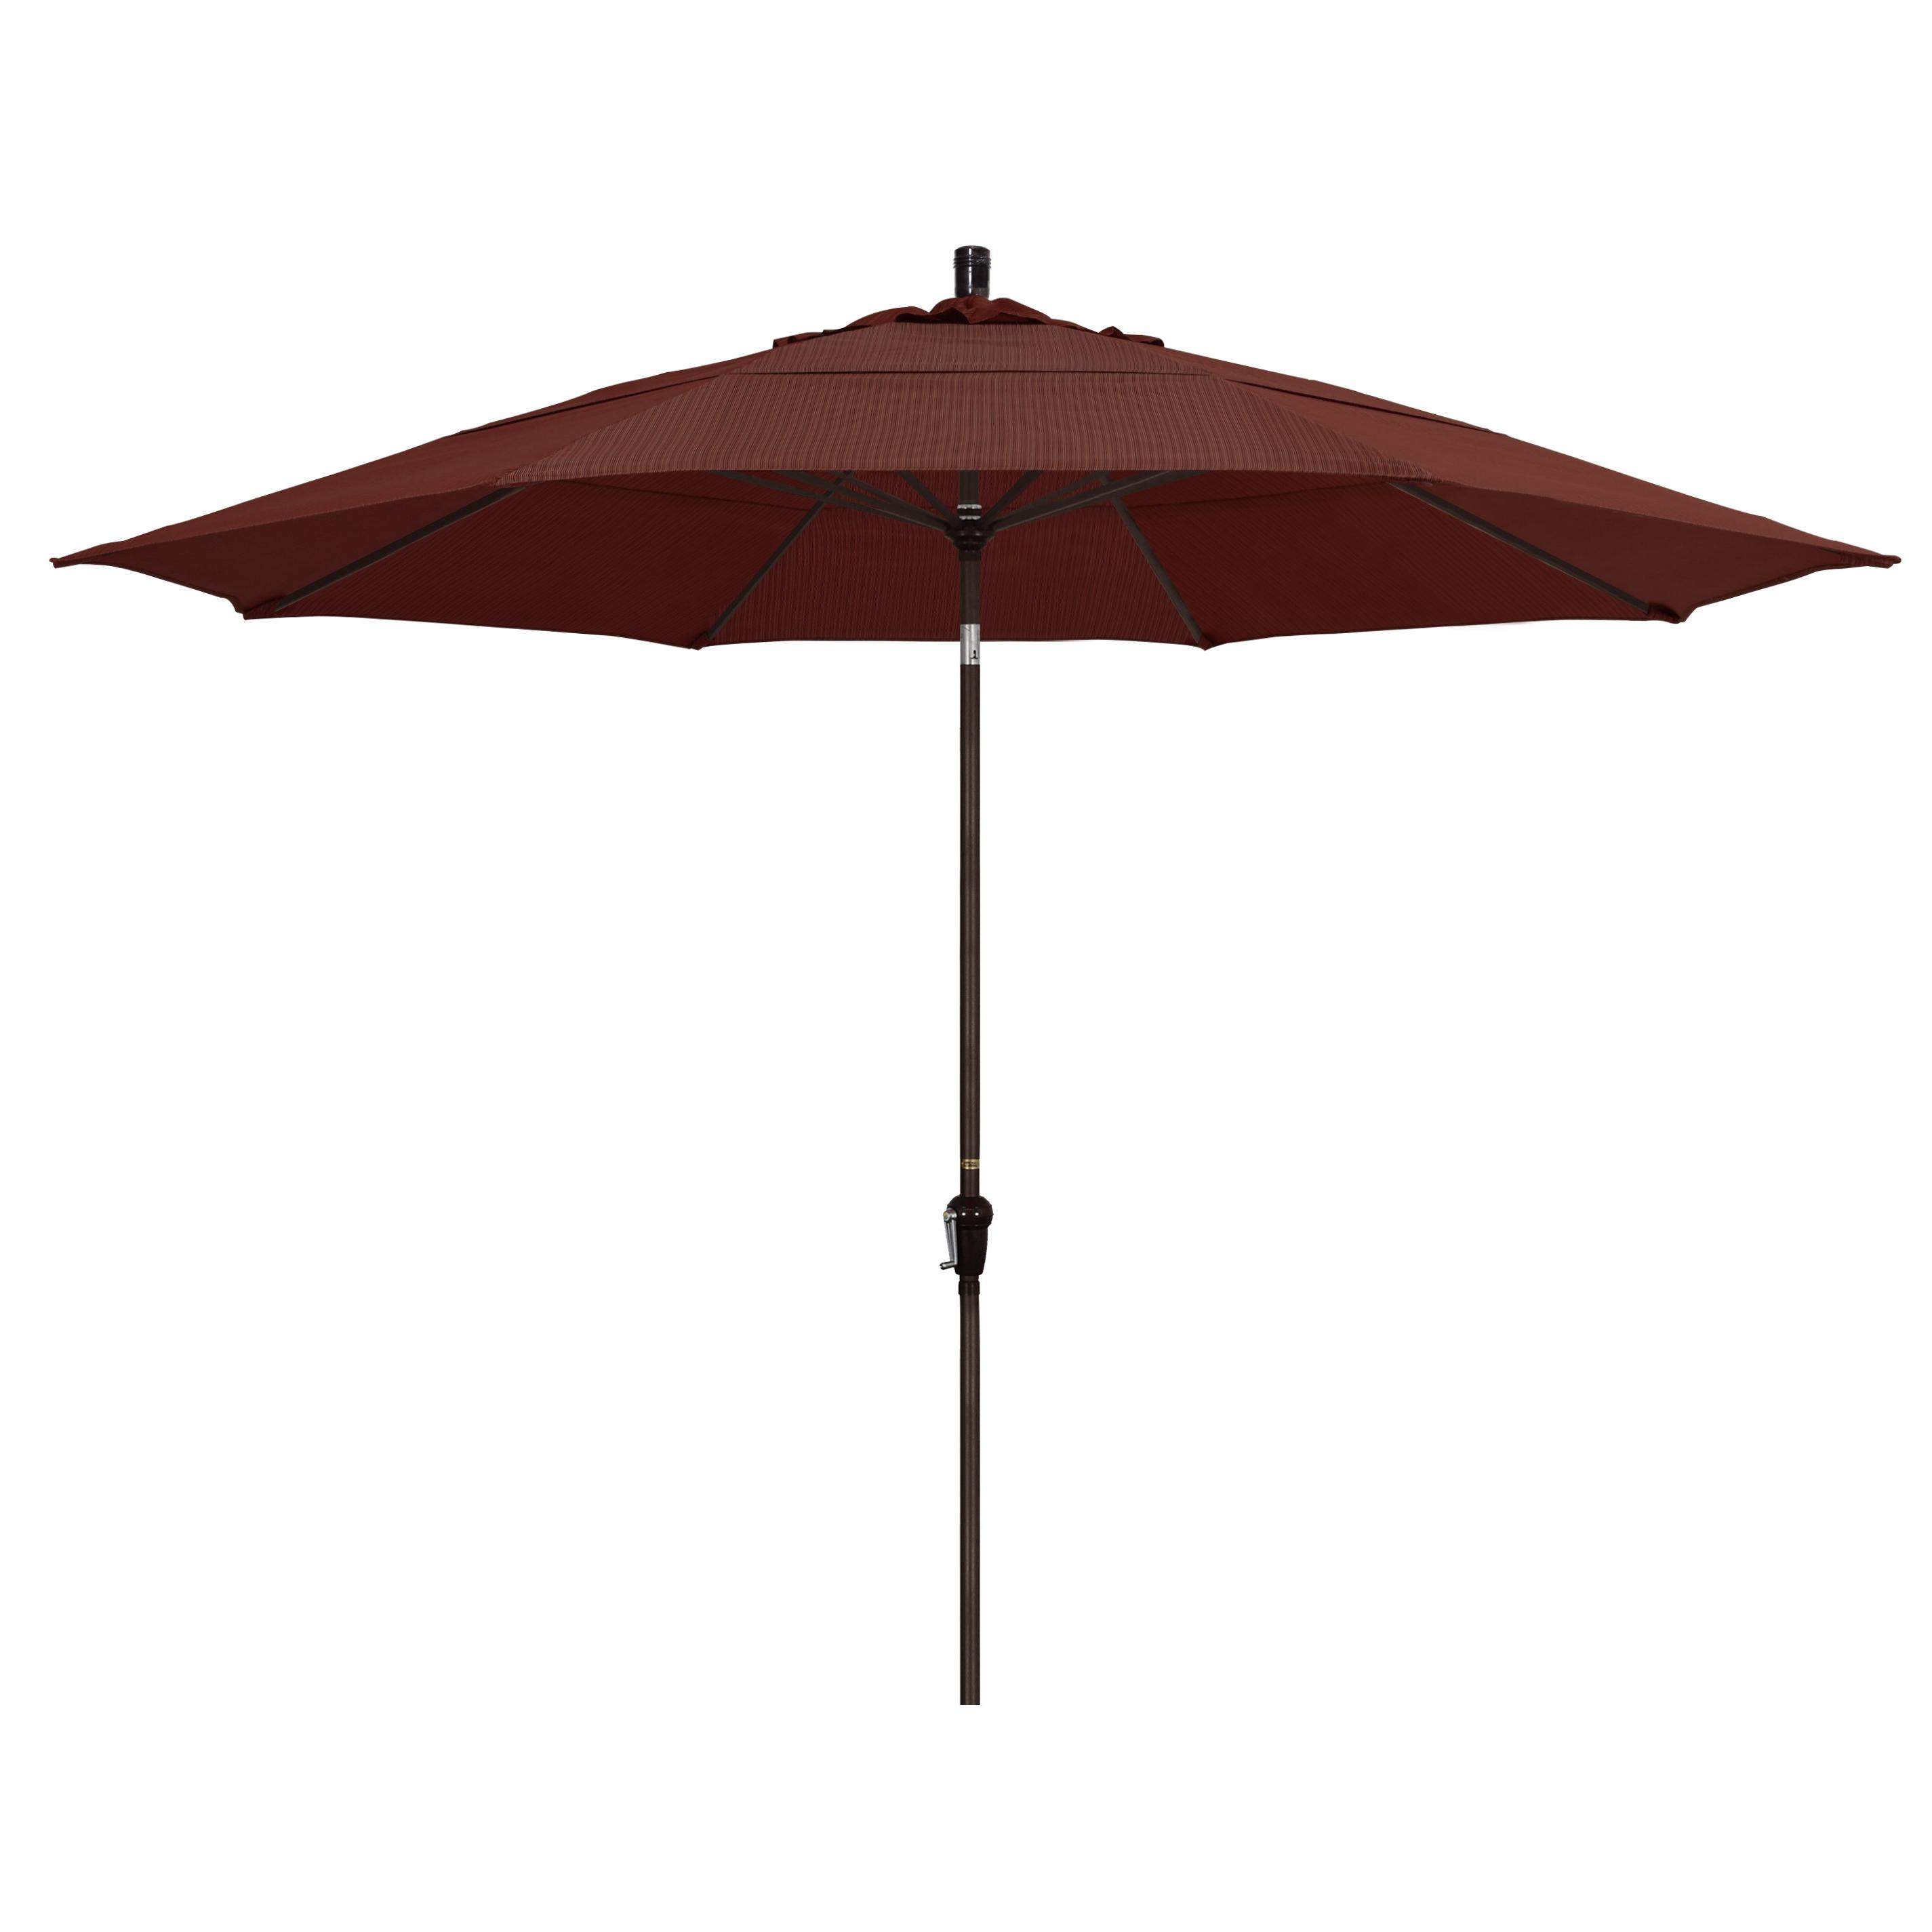 Mullaney Market Umbrellas Intended For Well Liked Mullaney 11' Market Umbrella (View 10 of 20)